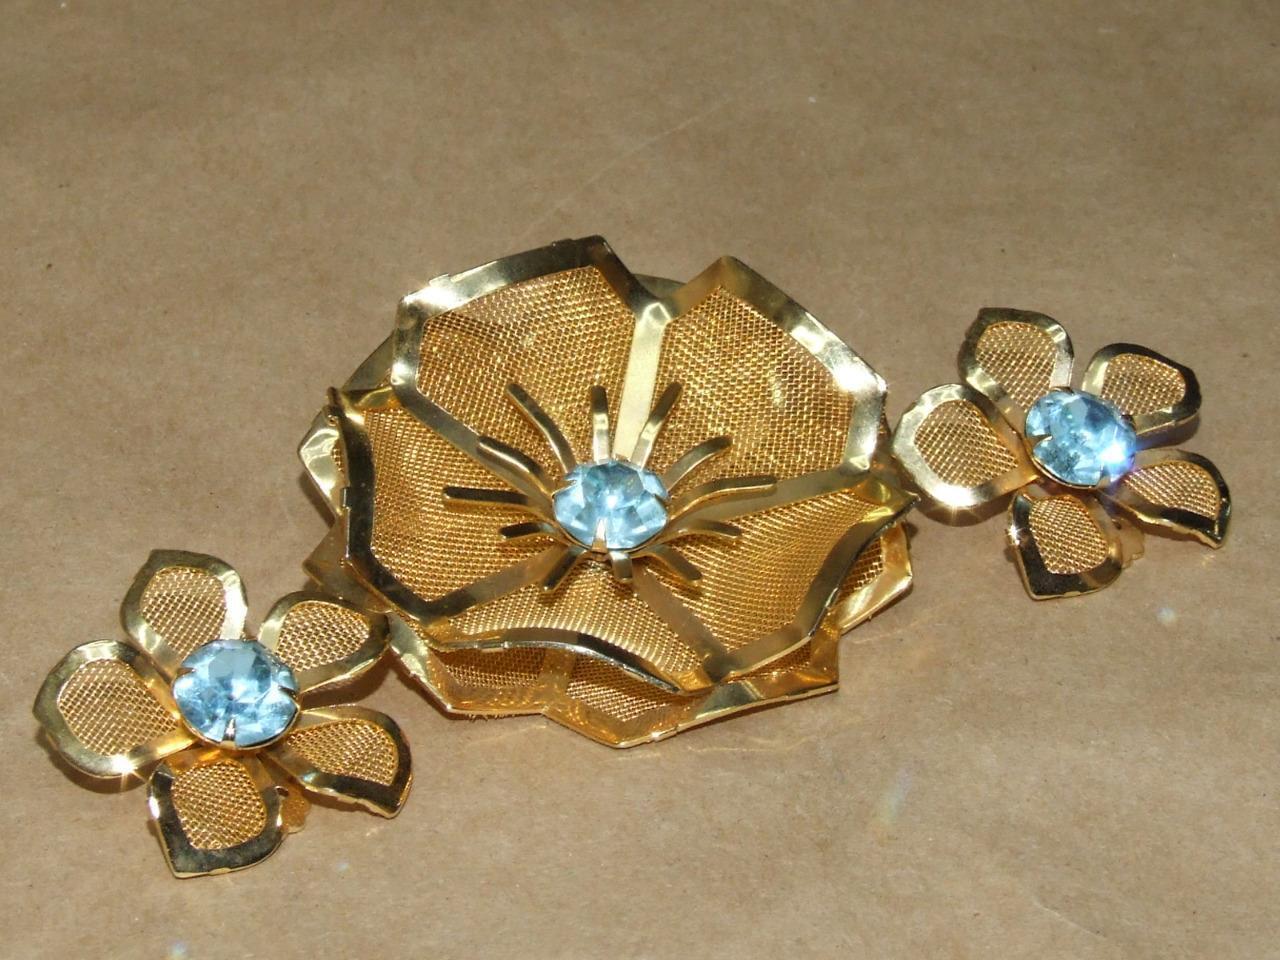 VTG 60s gold Tone Mesh & Sky bluee Rhinestone Flower Pin Brooch Clip Earrings Set